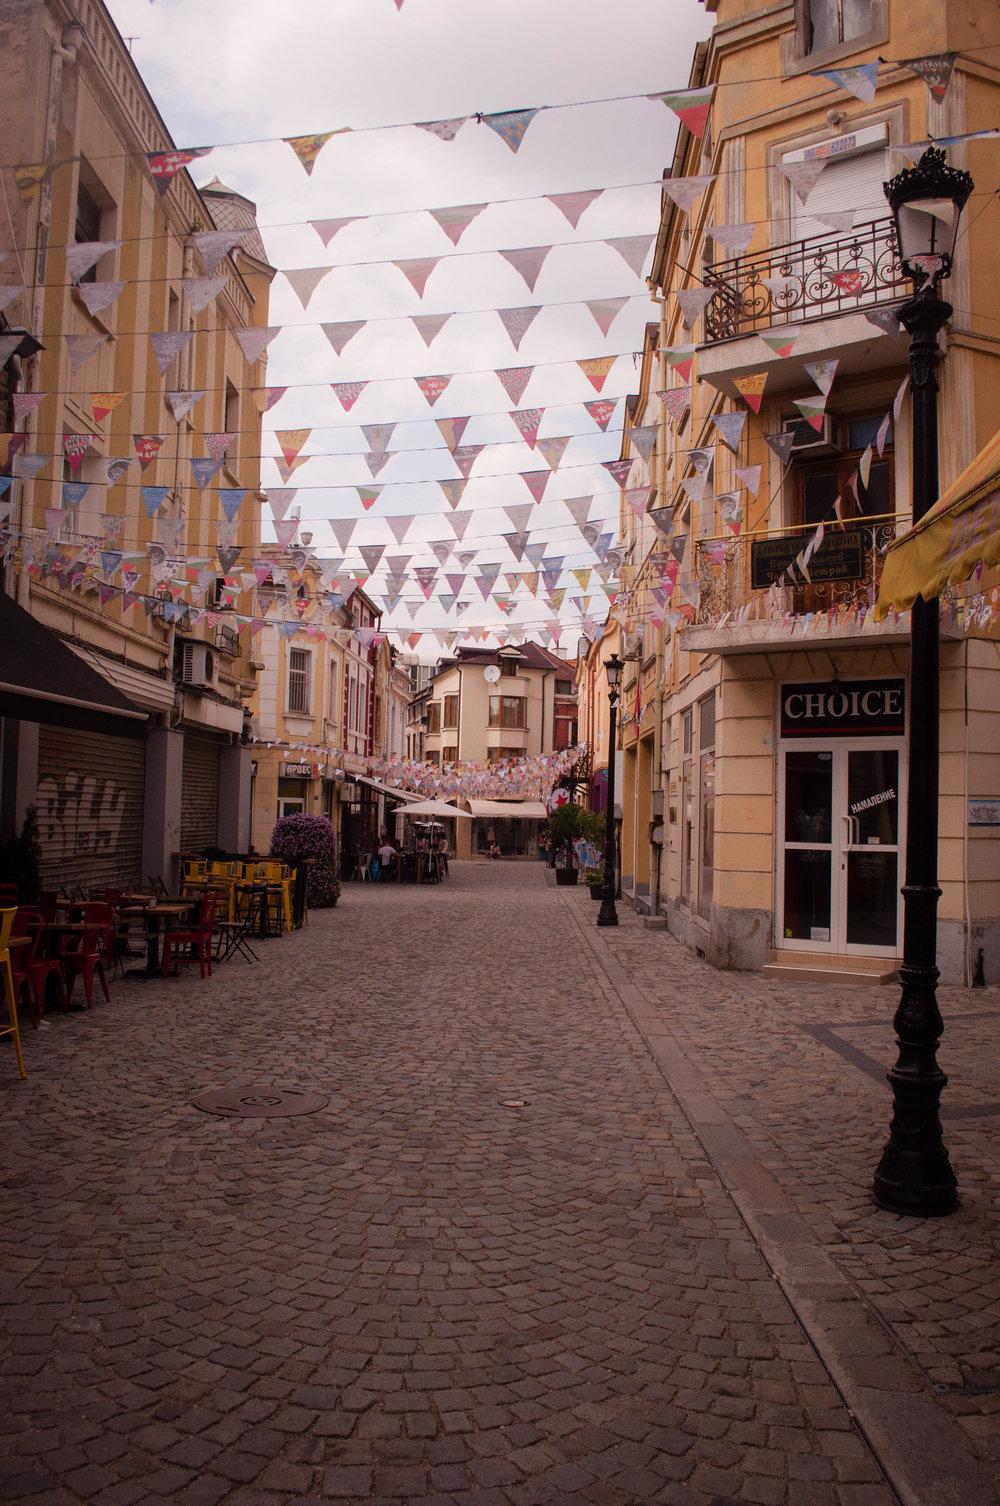 Street in Kapana,  Ploviv (Bulgaria) with streamers and graffiti.